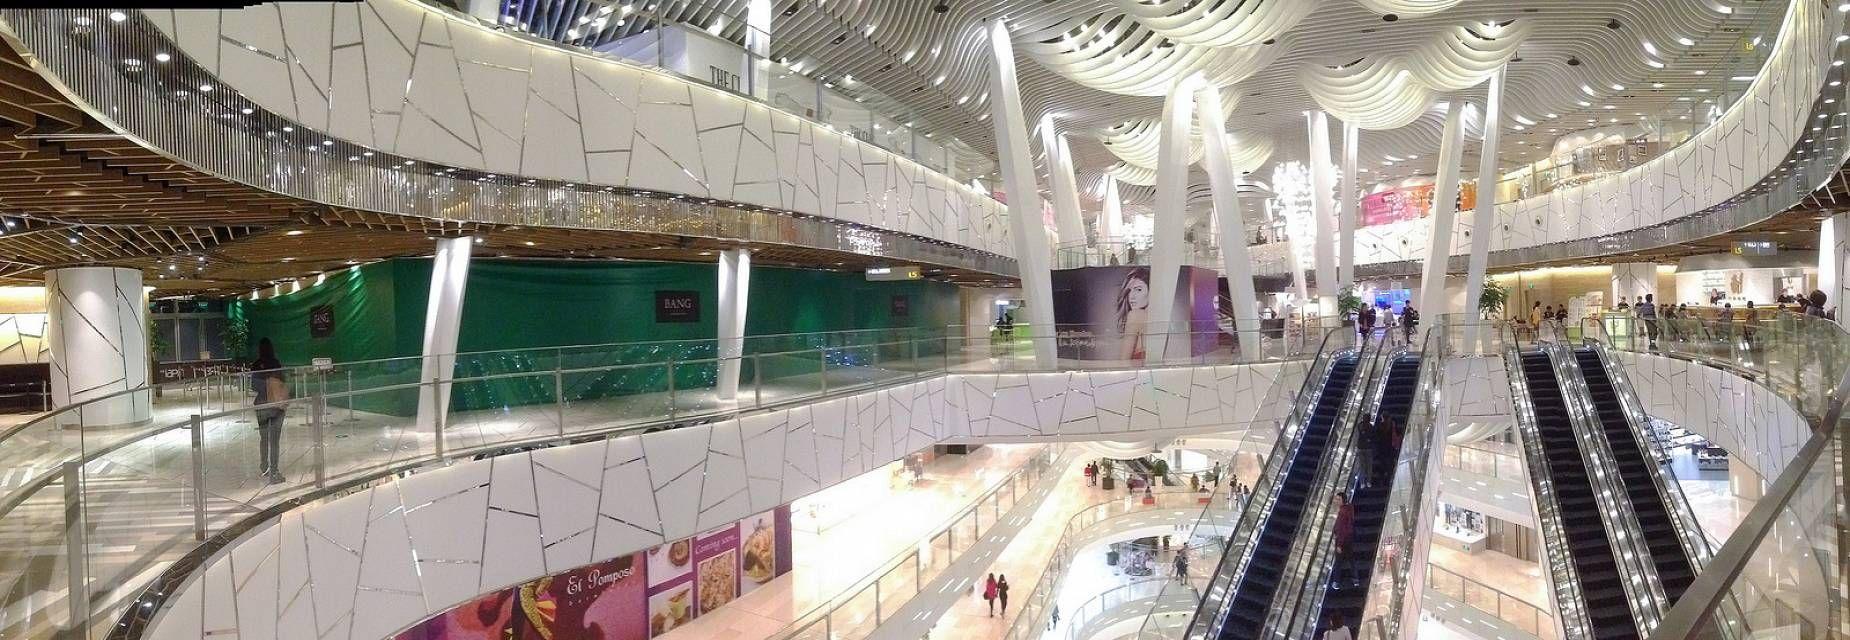 iapm mall shanghai google search arch shopping center